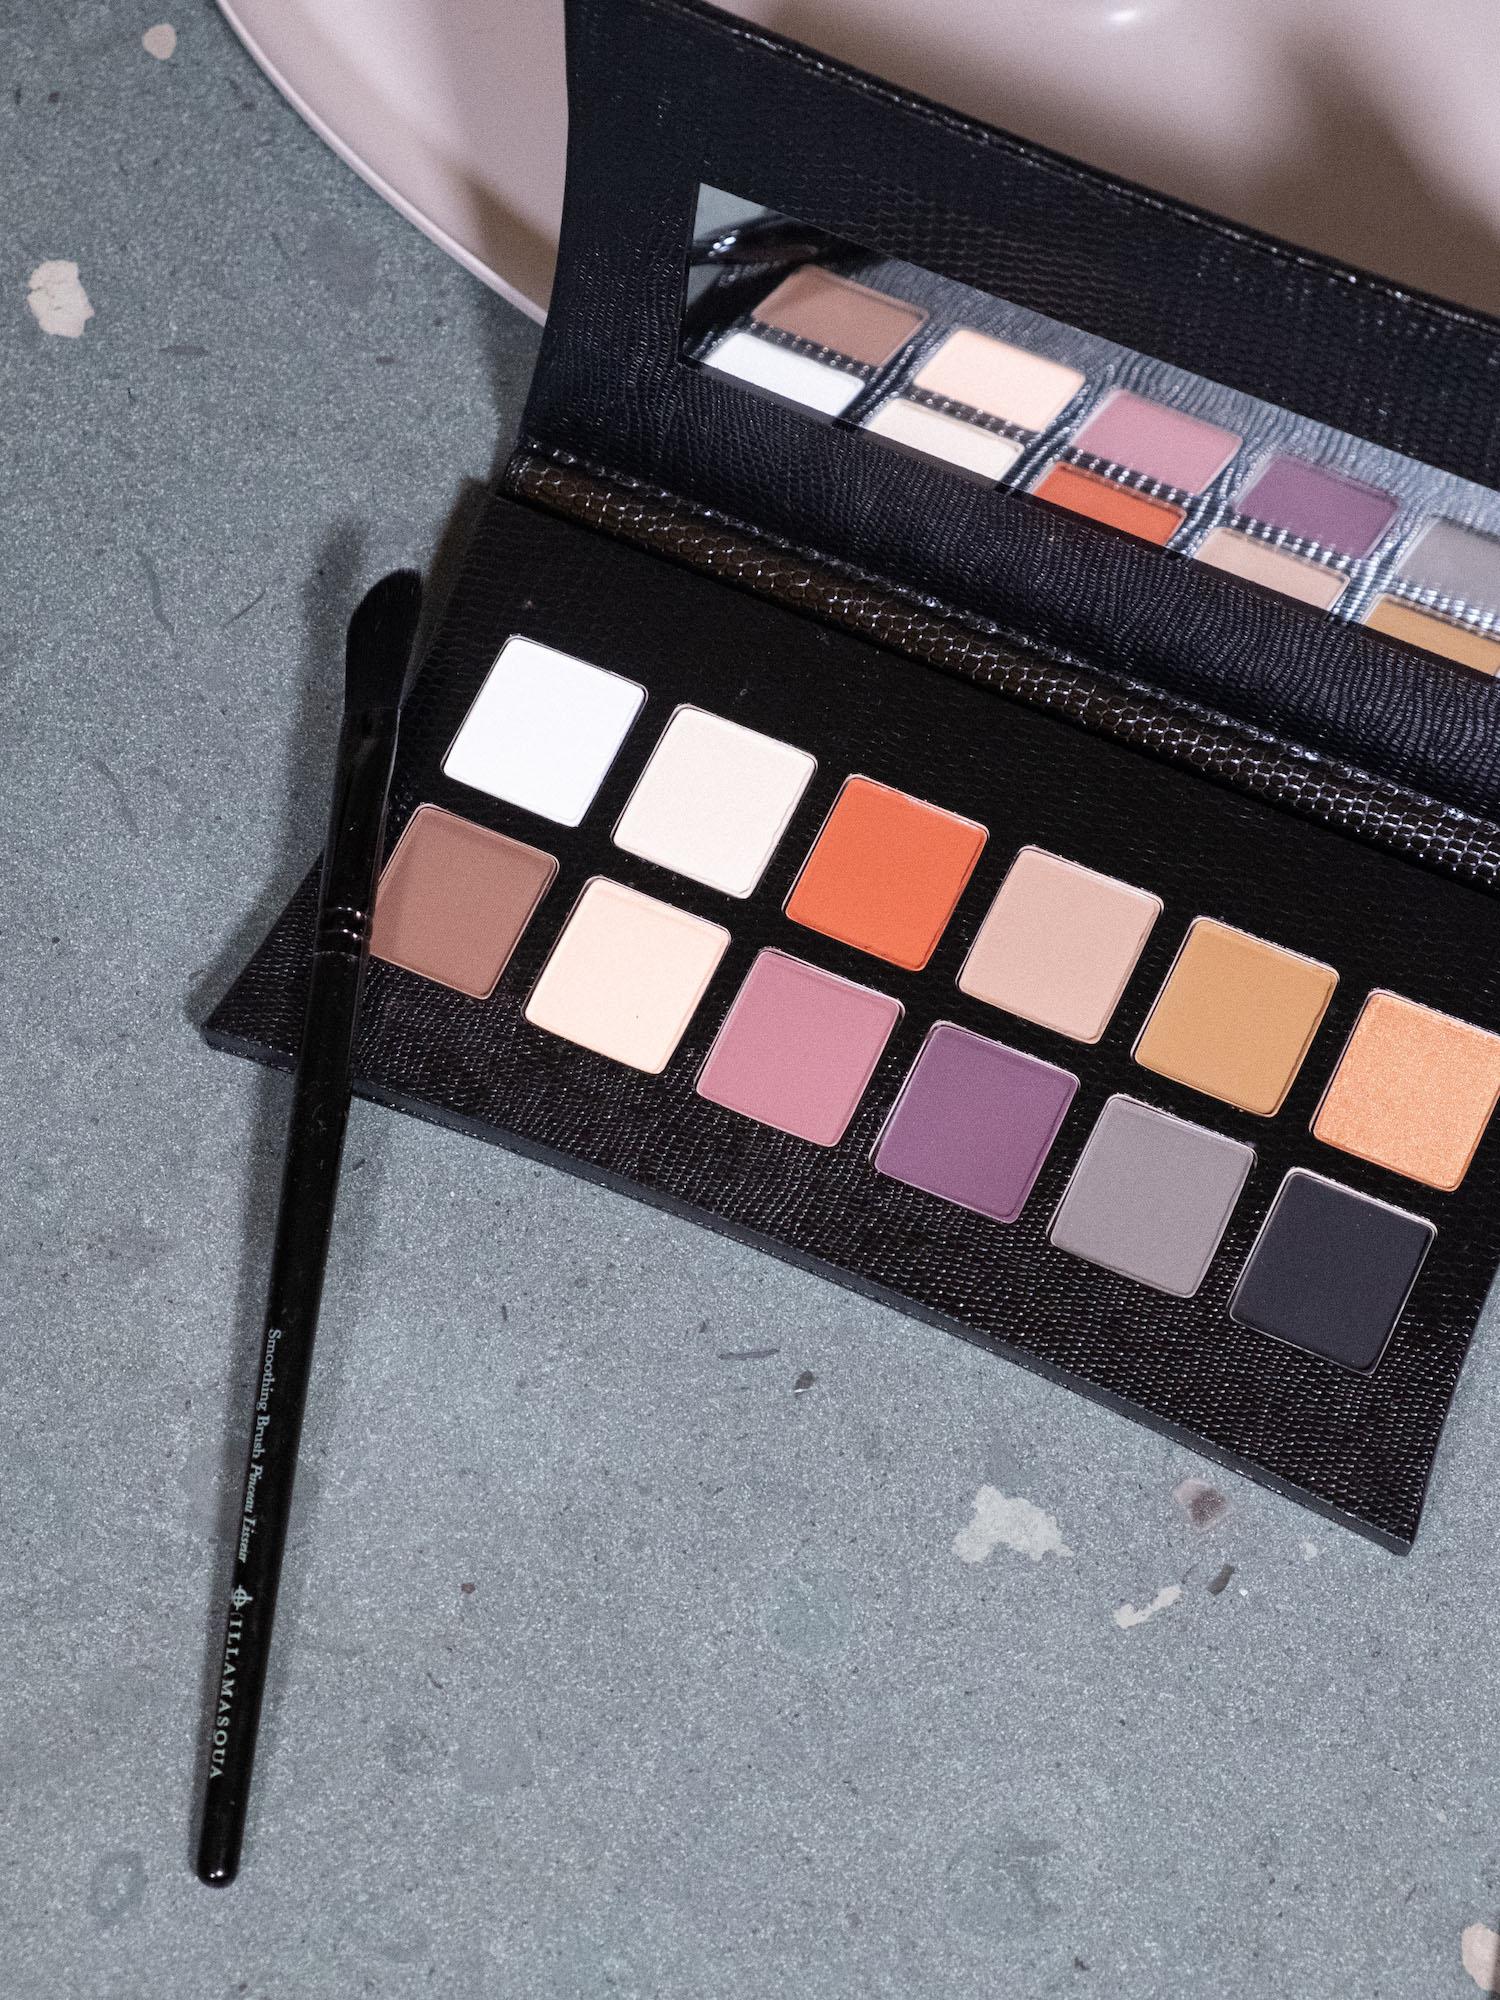 Bare Minds Adventskalender Illamasqua Artistry Palette Elemental 2